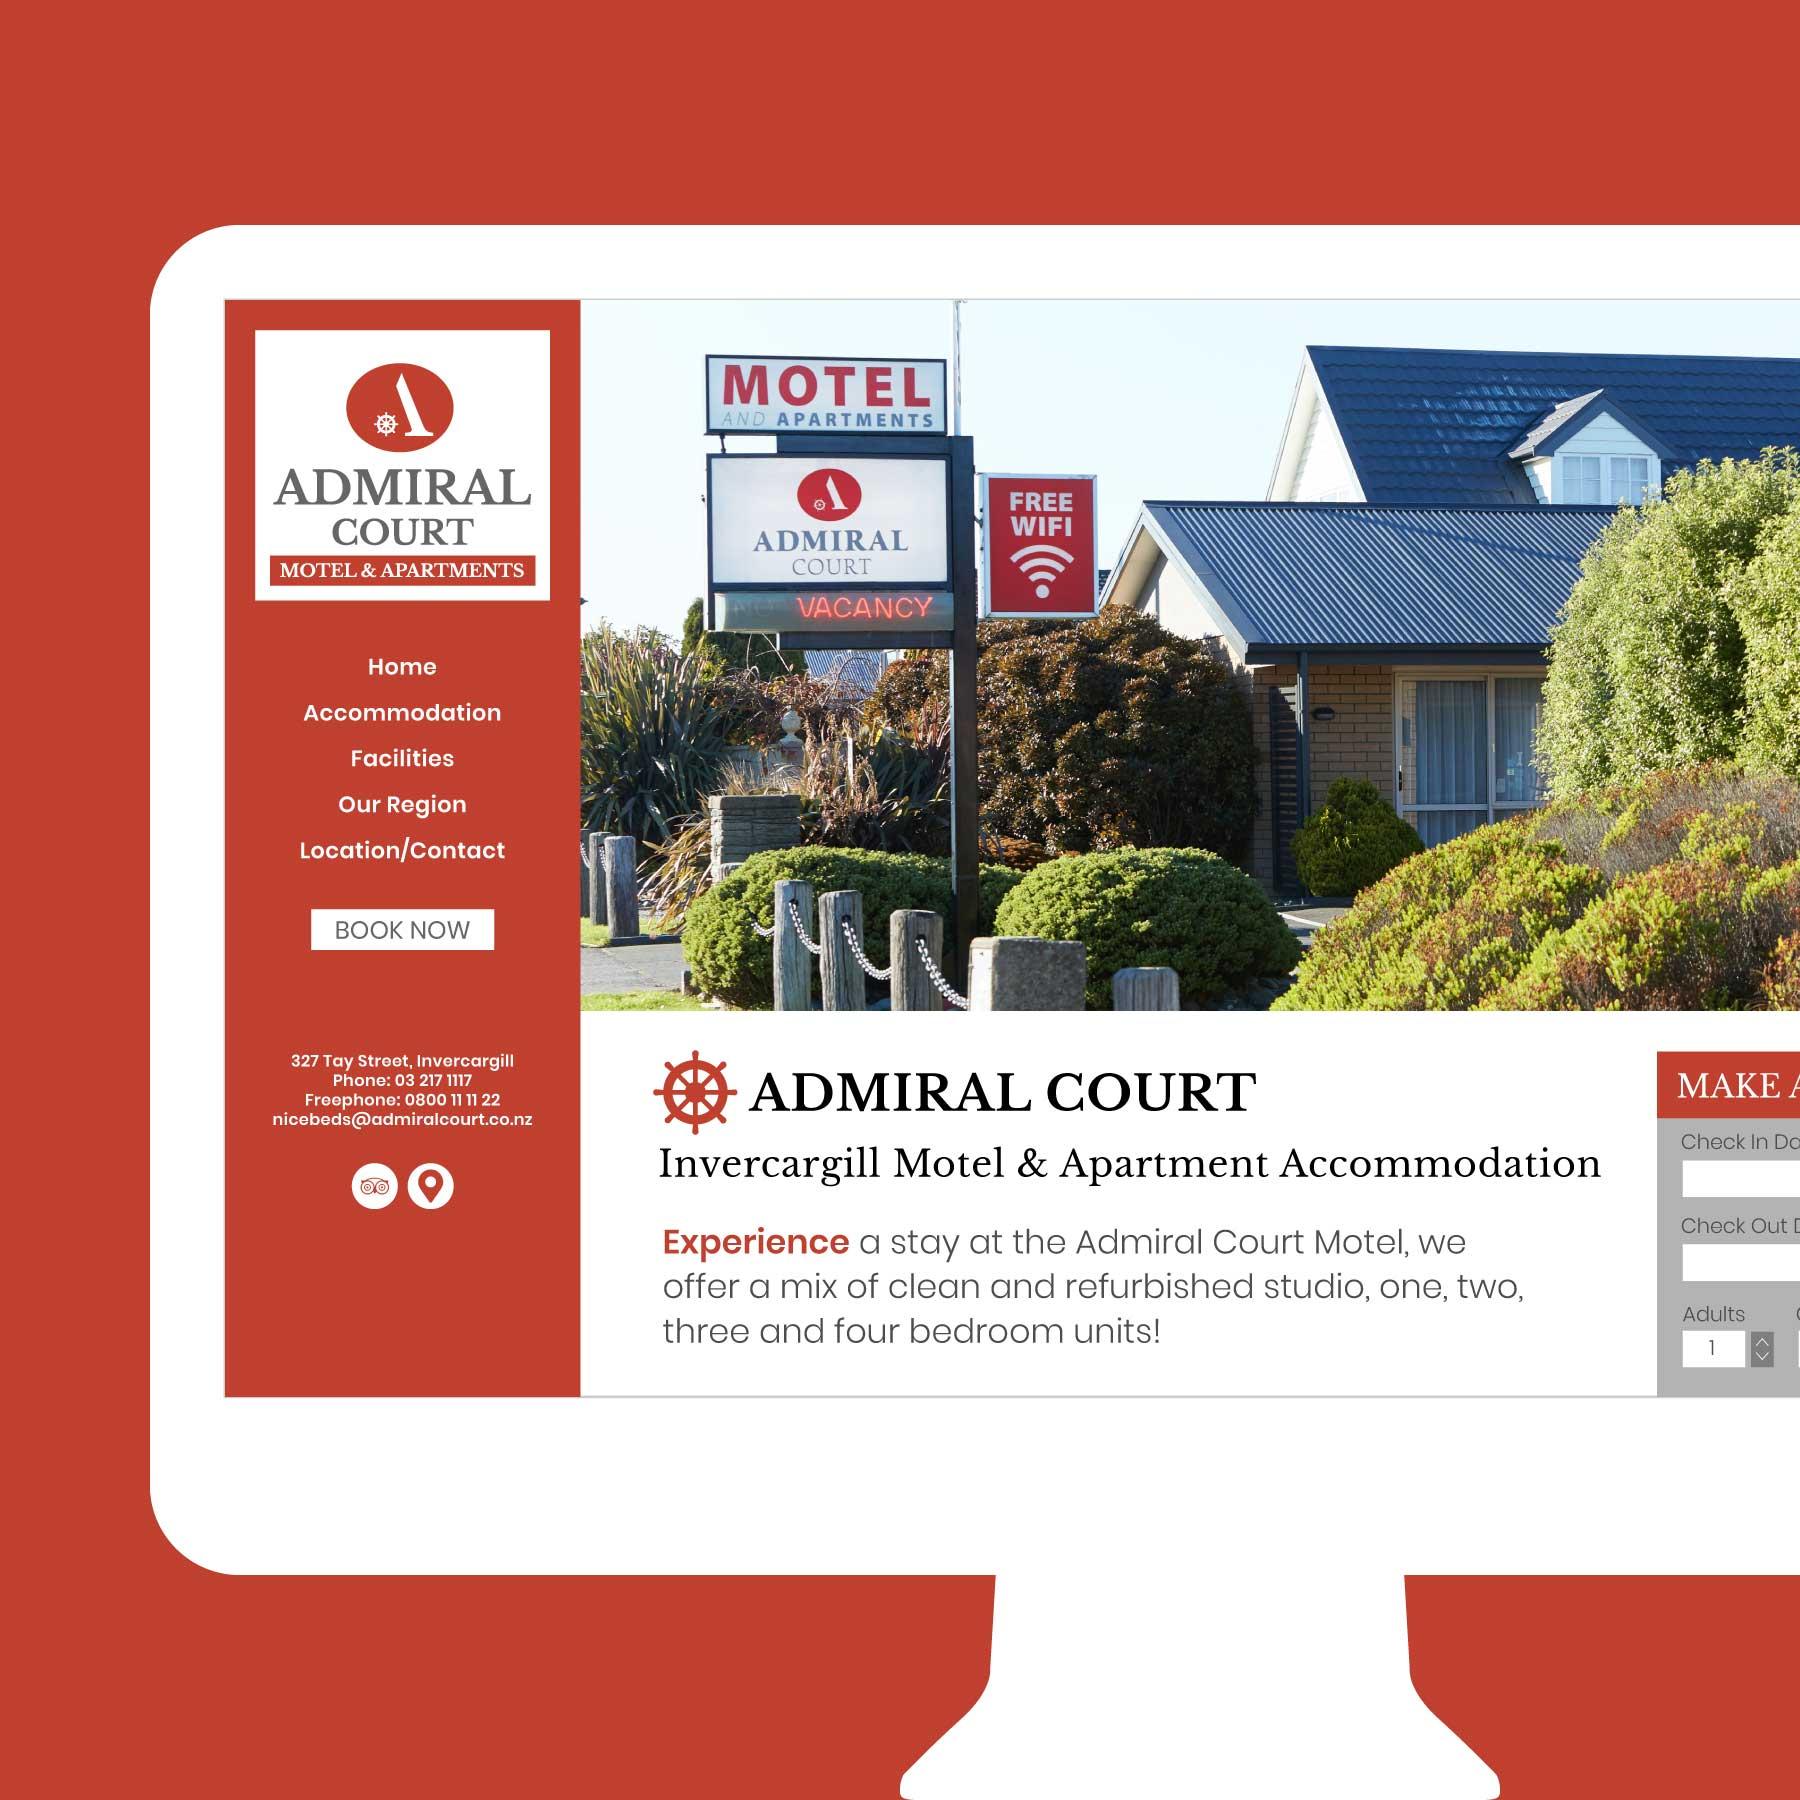 Admiral Court Motel & Apartments Invercargill Web Design